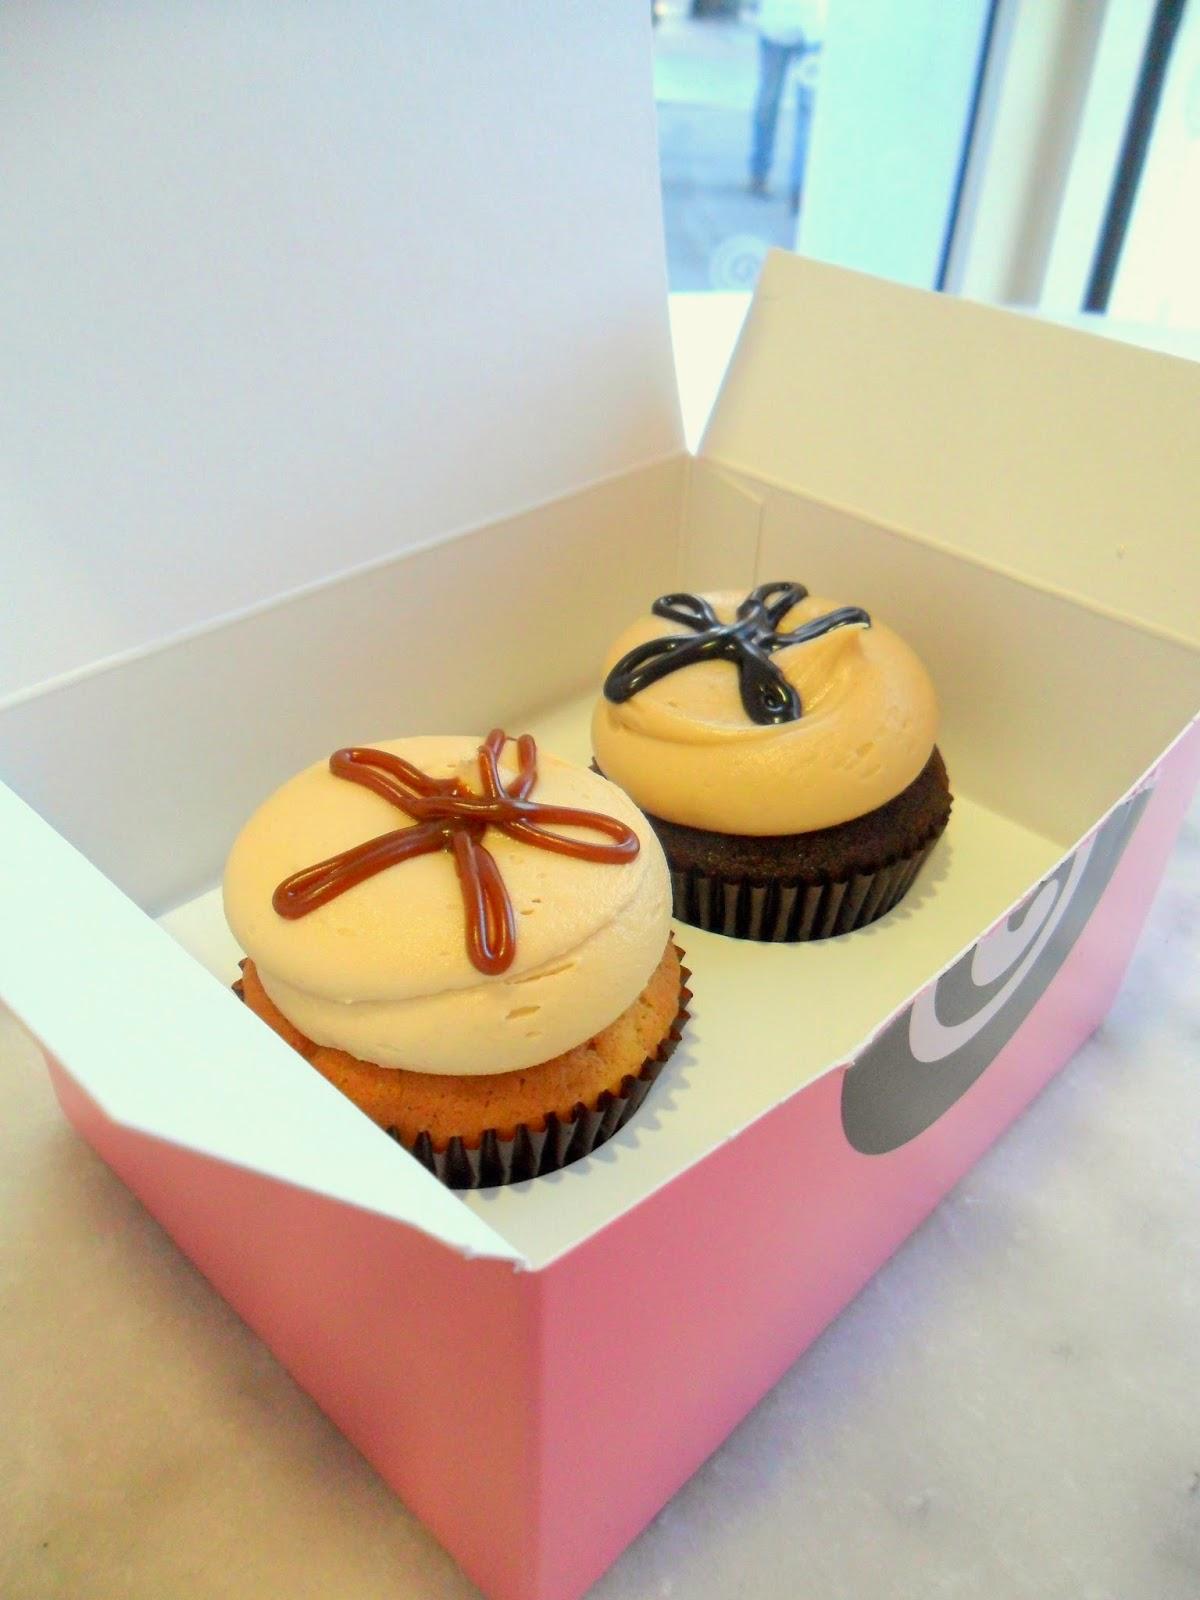 Georgetown Cupcake (DC Cupcakes)